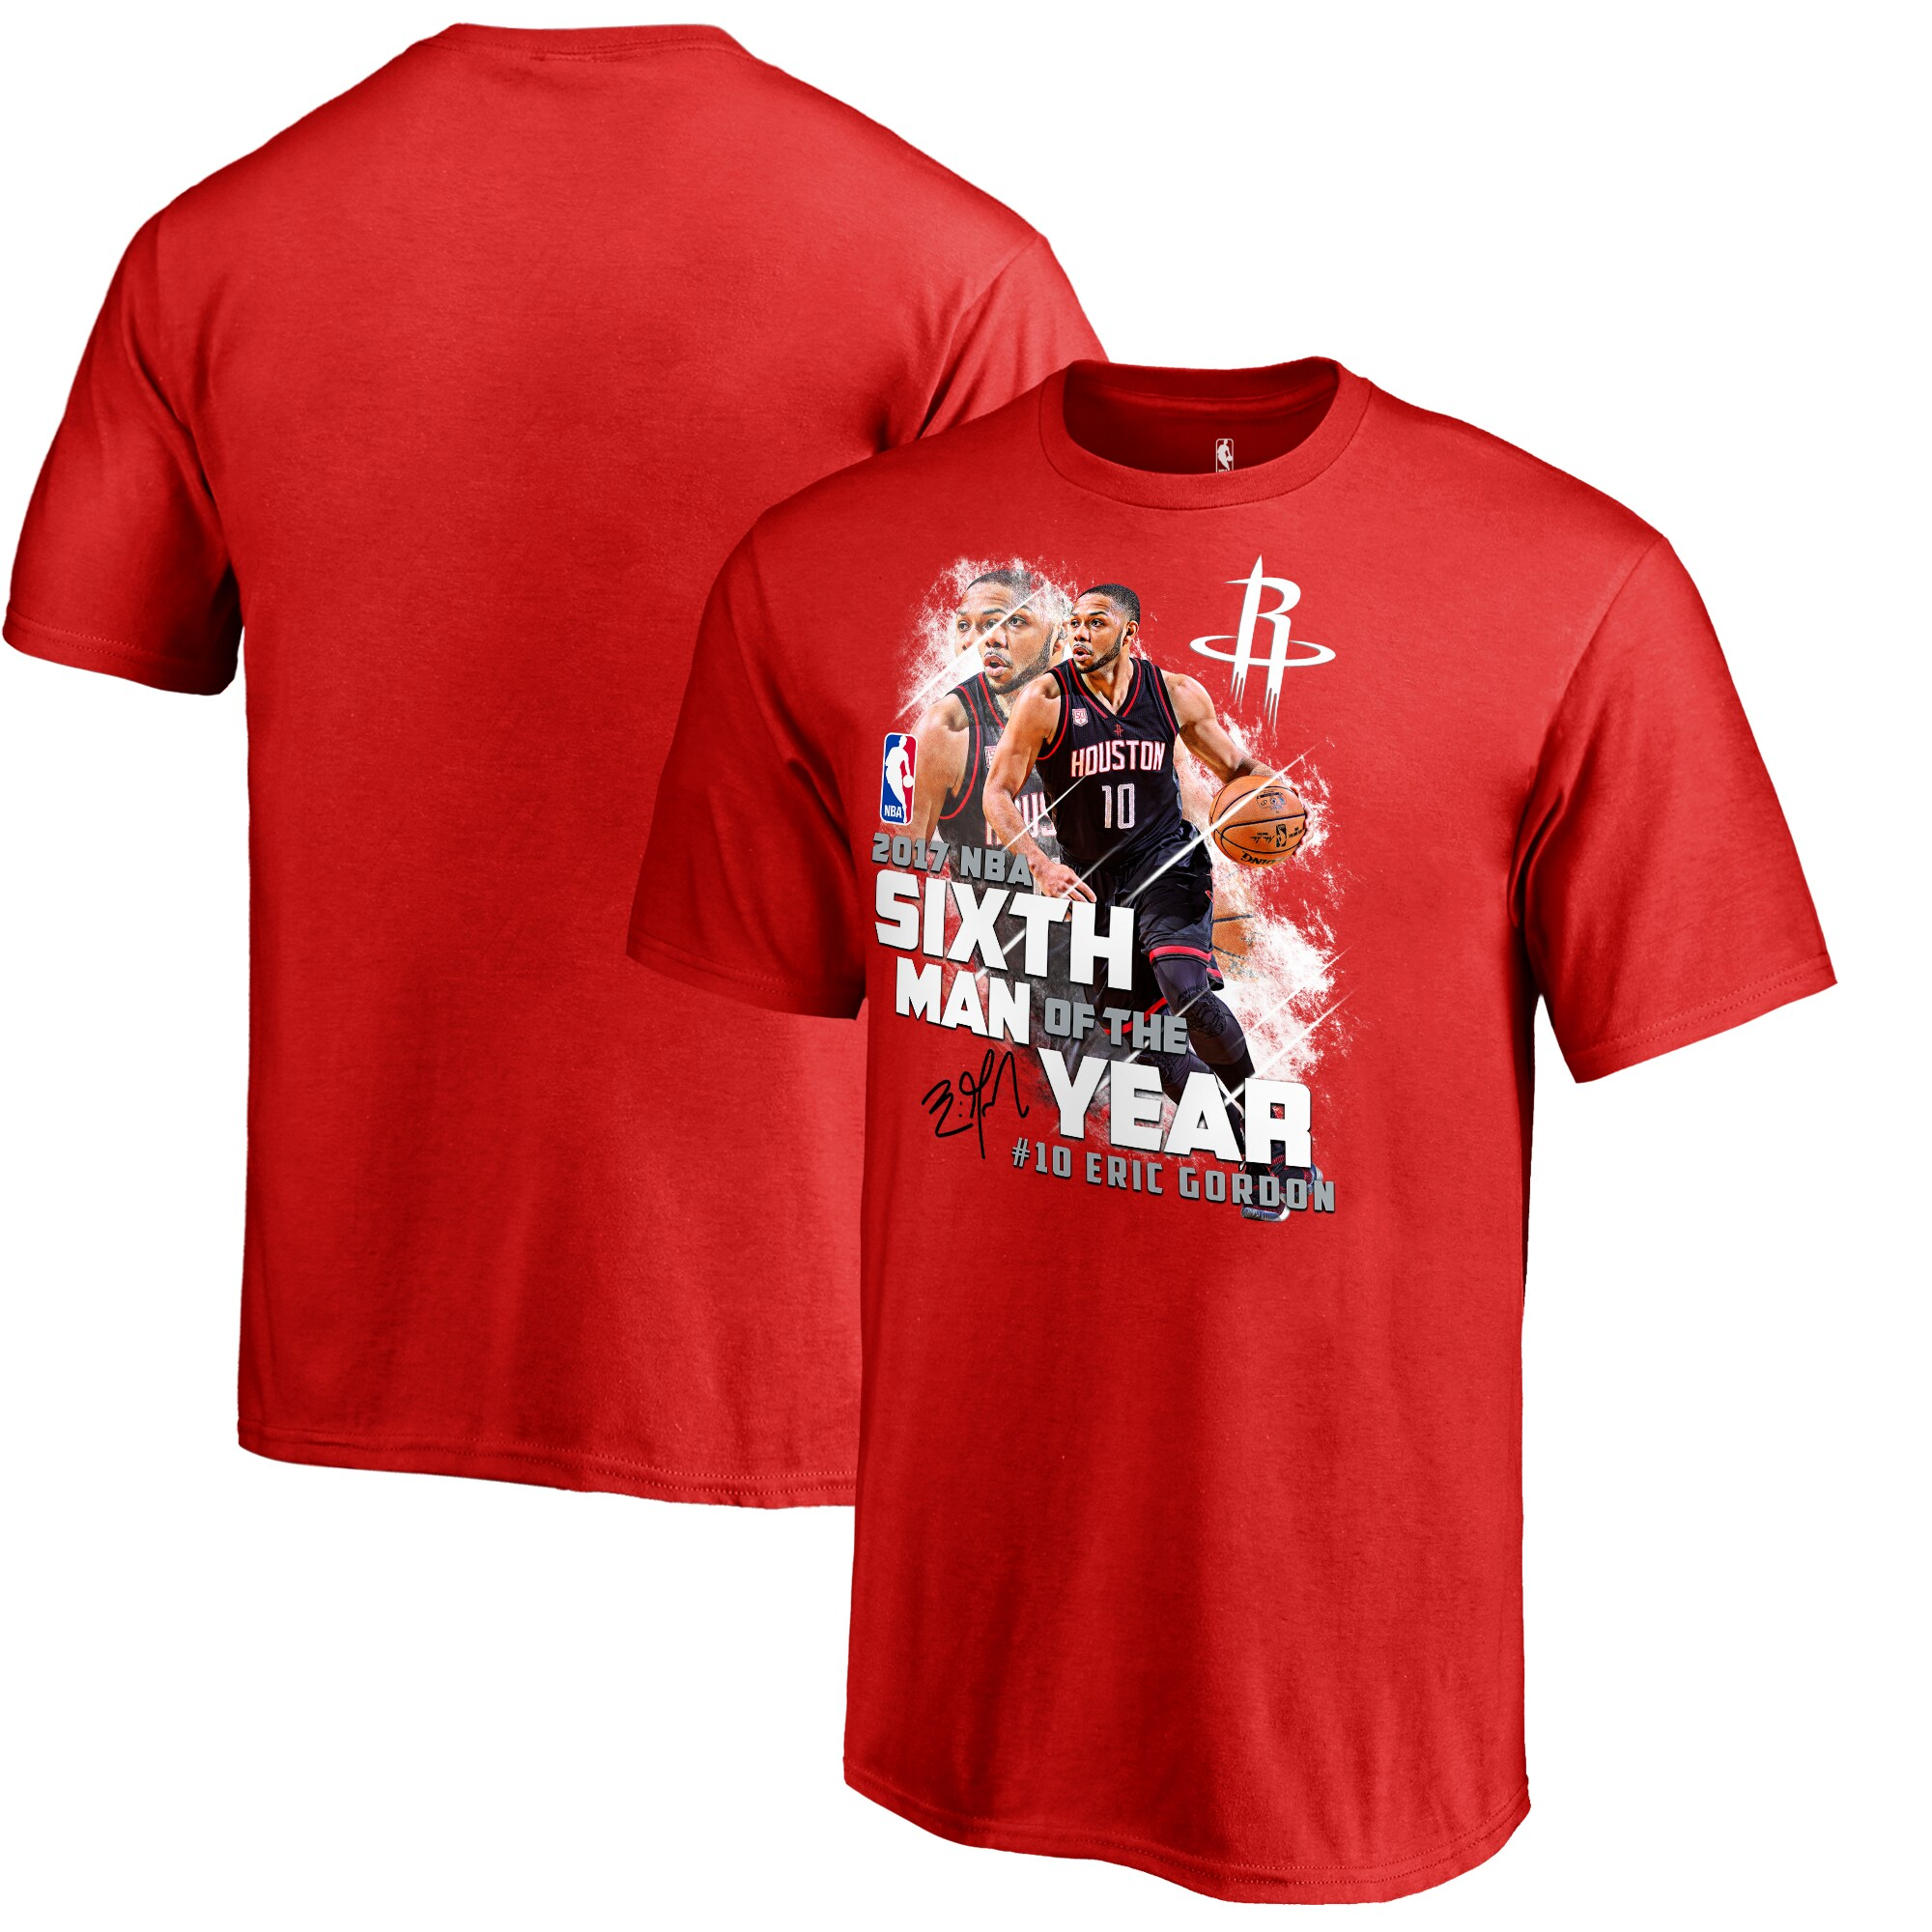 Eric Gordon Houston Rockets Fanatics Branded Youth 2017 NBA 6th Man Of The Year T-Shirt - Red